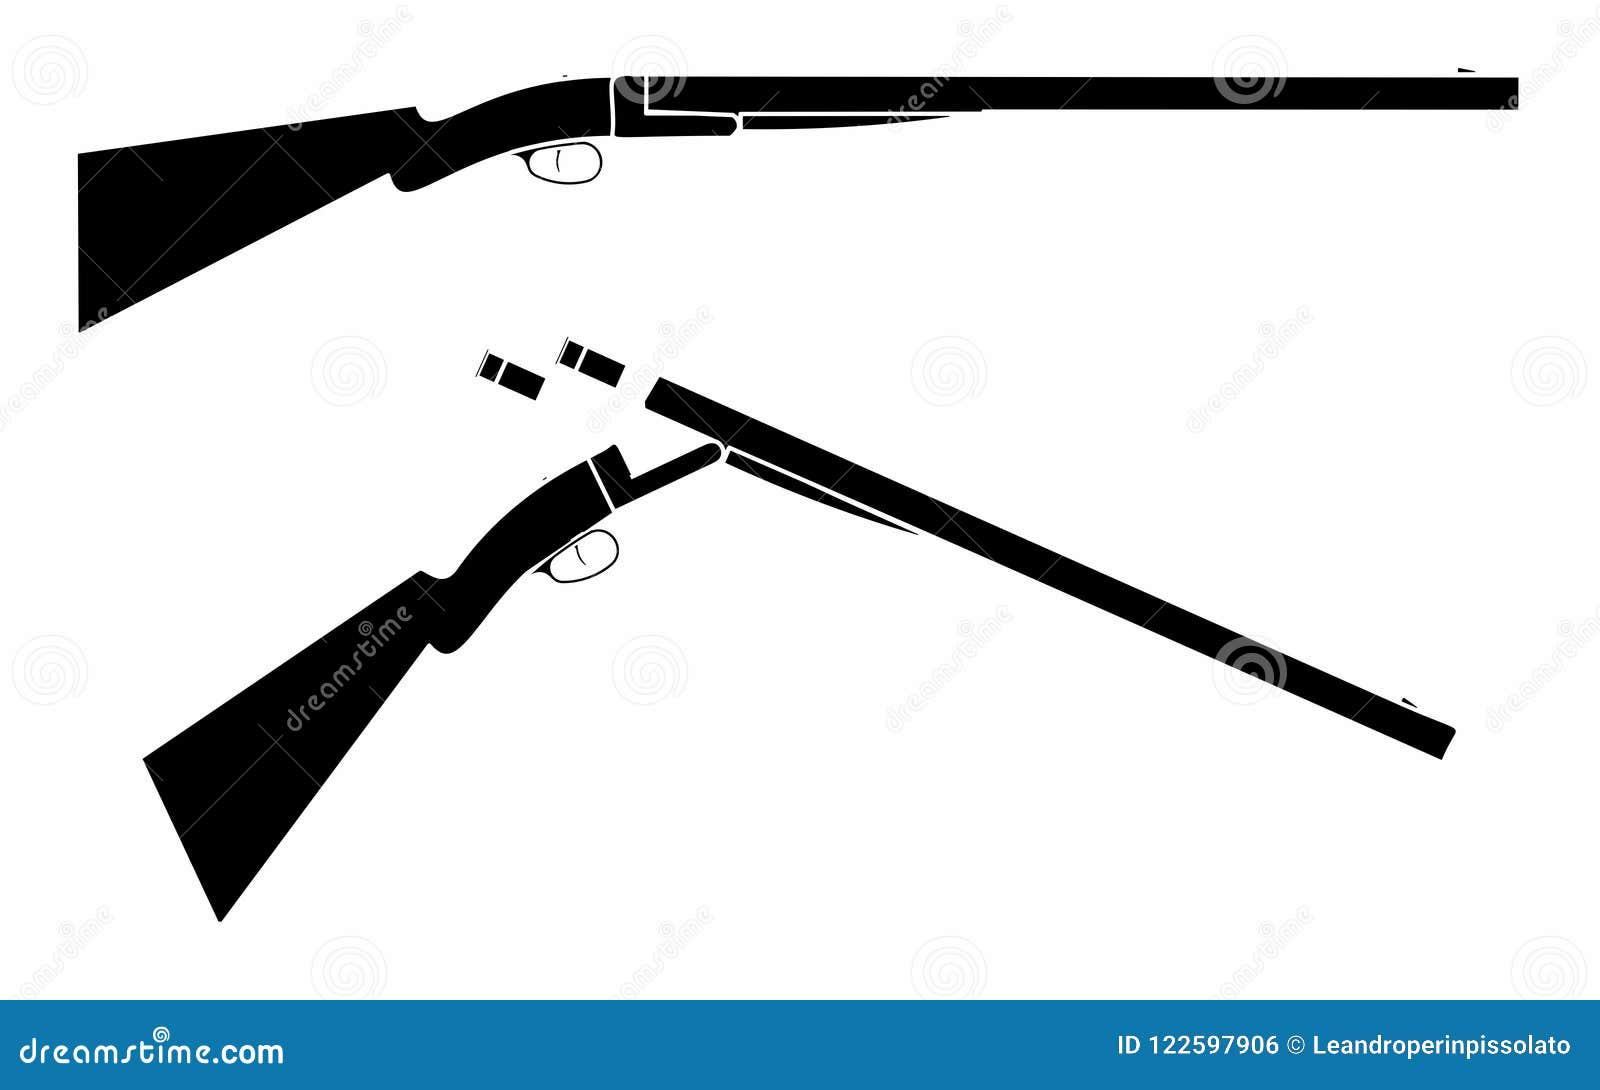 12 gauge shotgun simple black fill stock vector illustration of